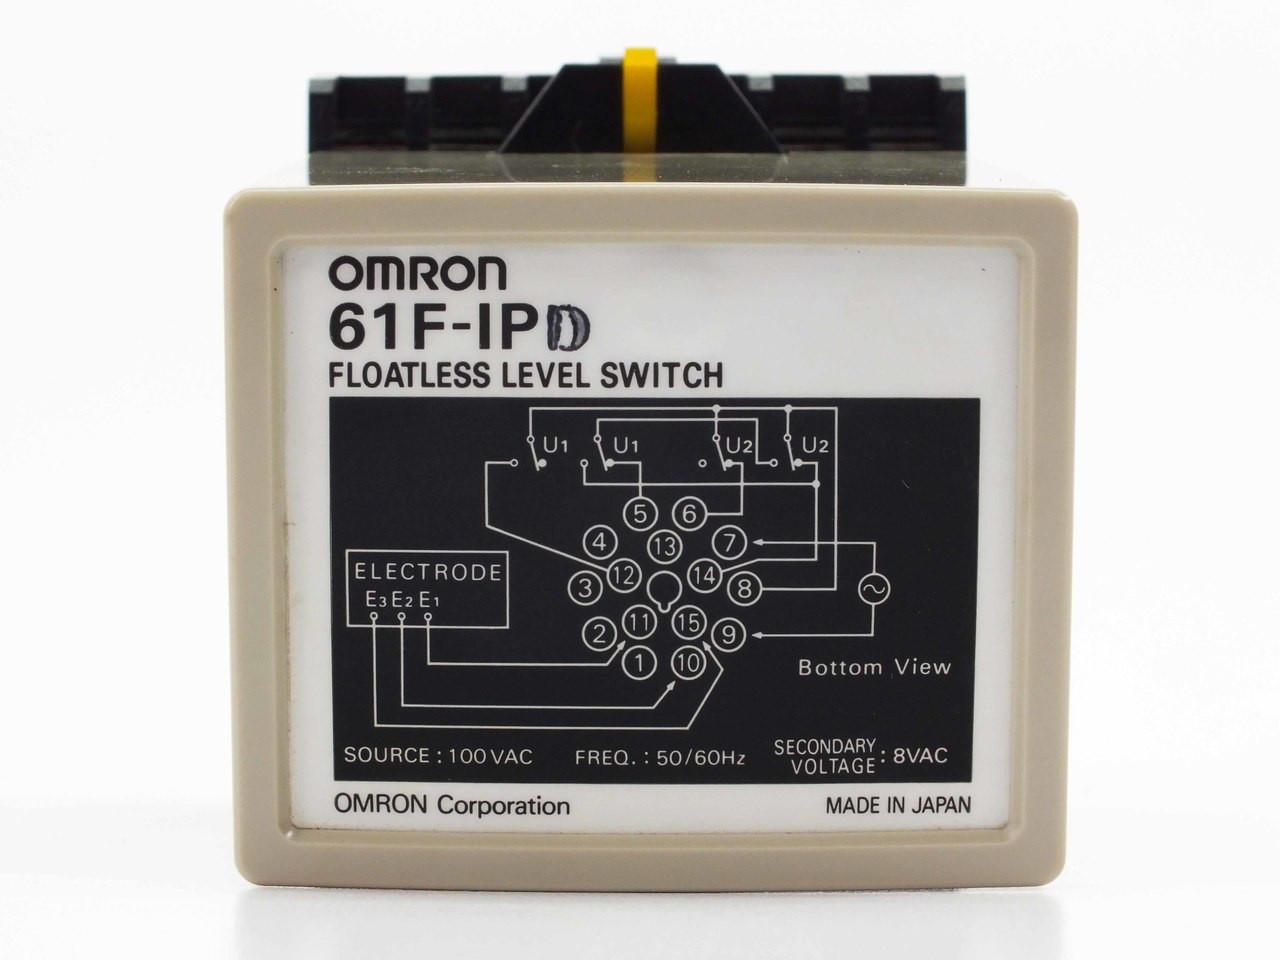 Omron 61f